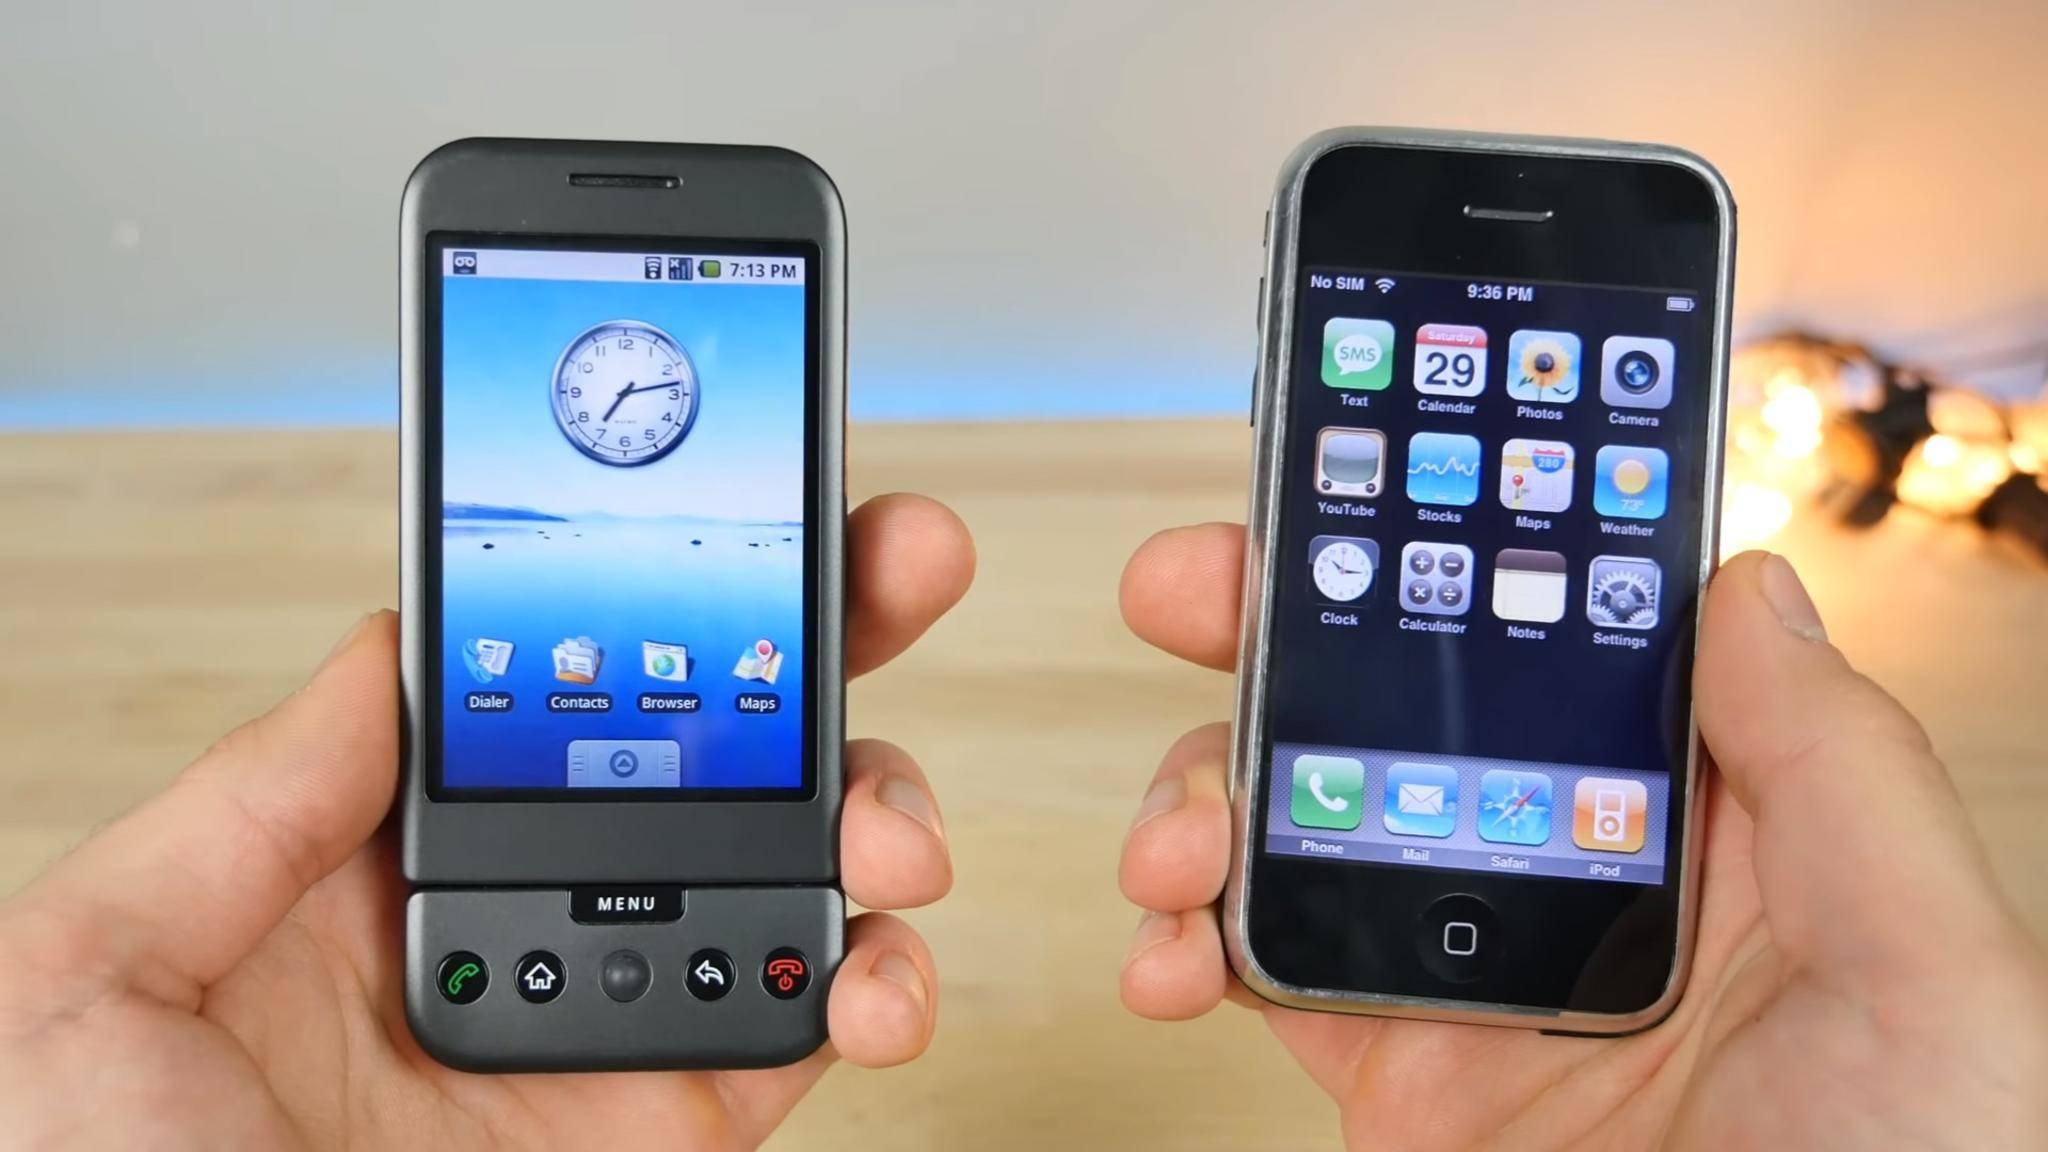 erstes iphone vs erstes android smartphone welches war besser. Black Bedroom Furniture Sets. Home Design Ideas